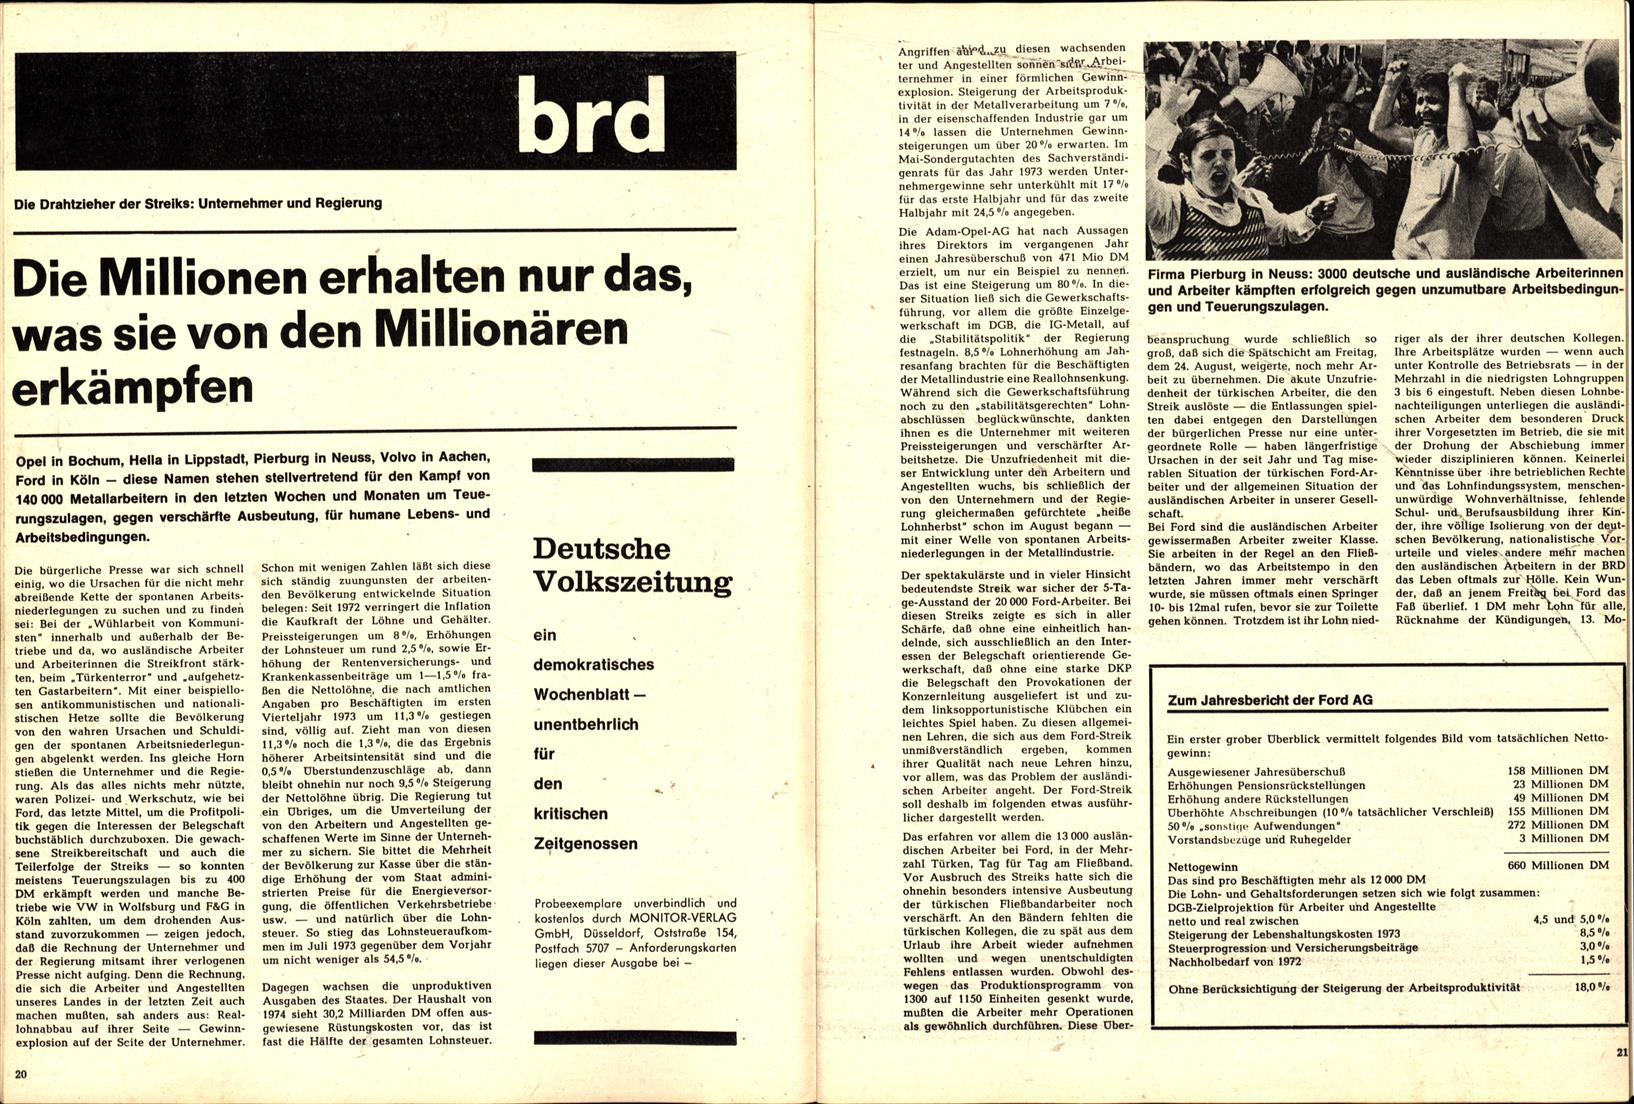 MSB_Spartakus_RB_19731000_11